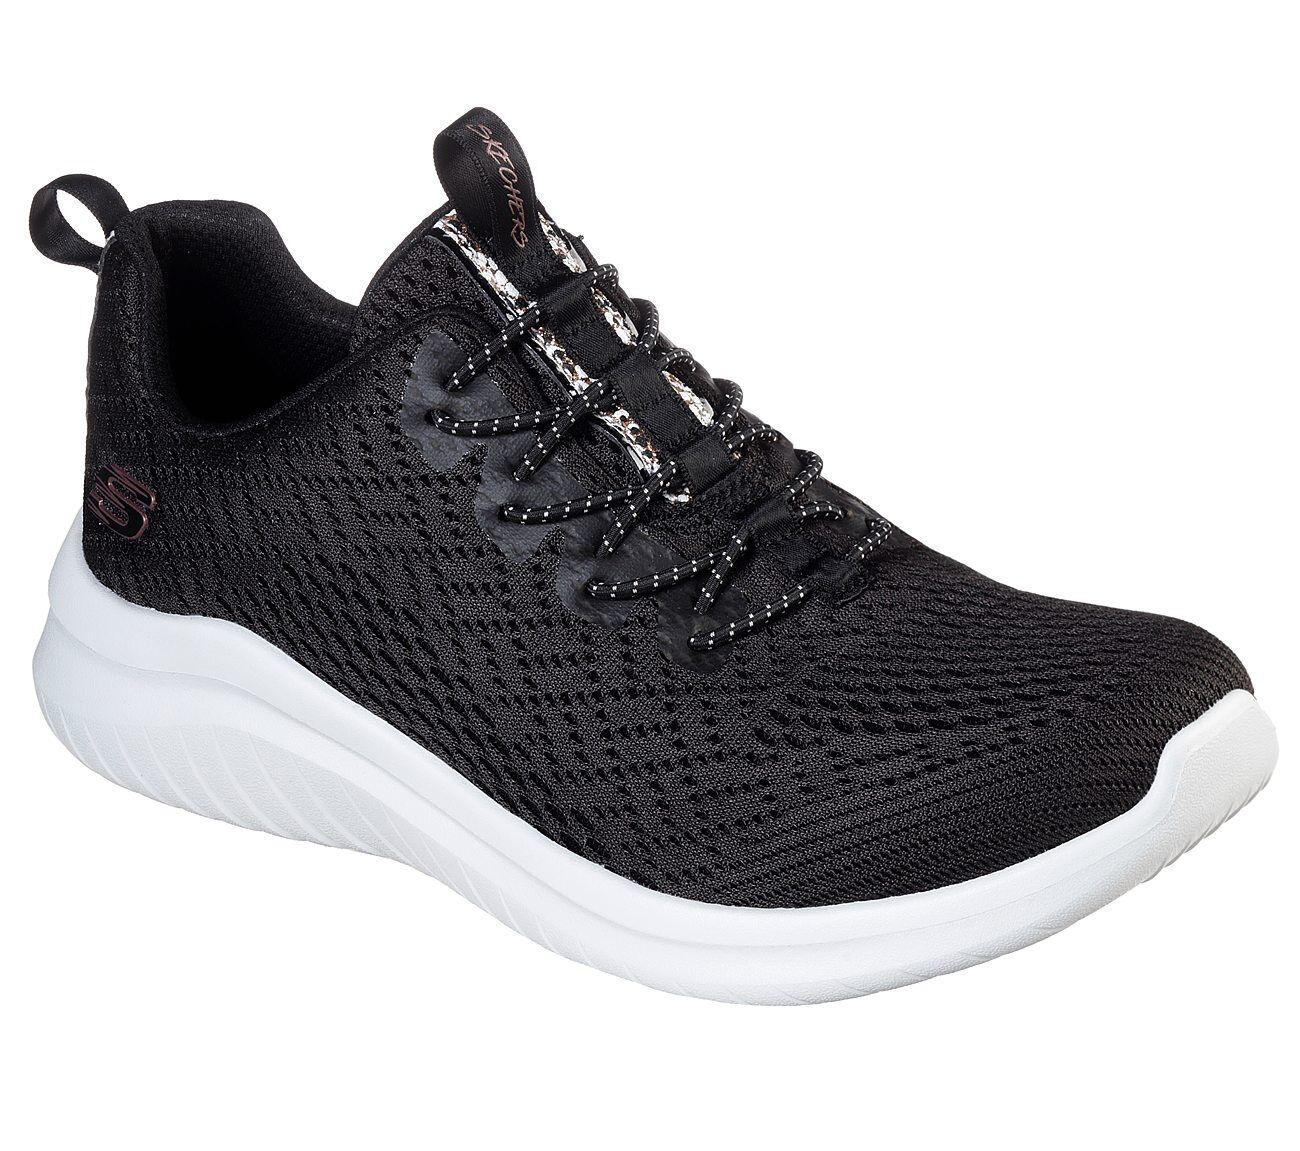 Memorándum comprar Enfermedad  Skechers Women's Ultra Flex 2.0 - Lite-Groove Black/White | Griggs